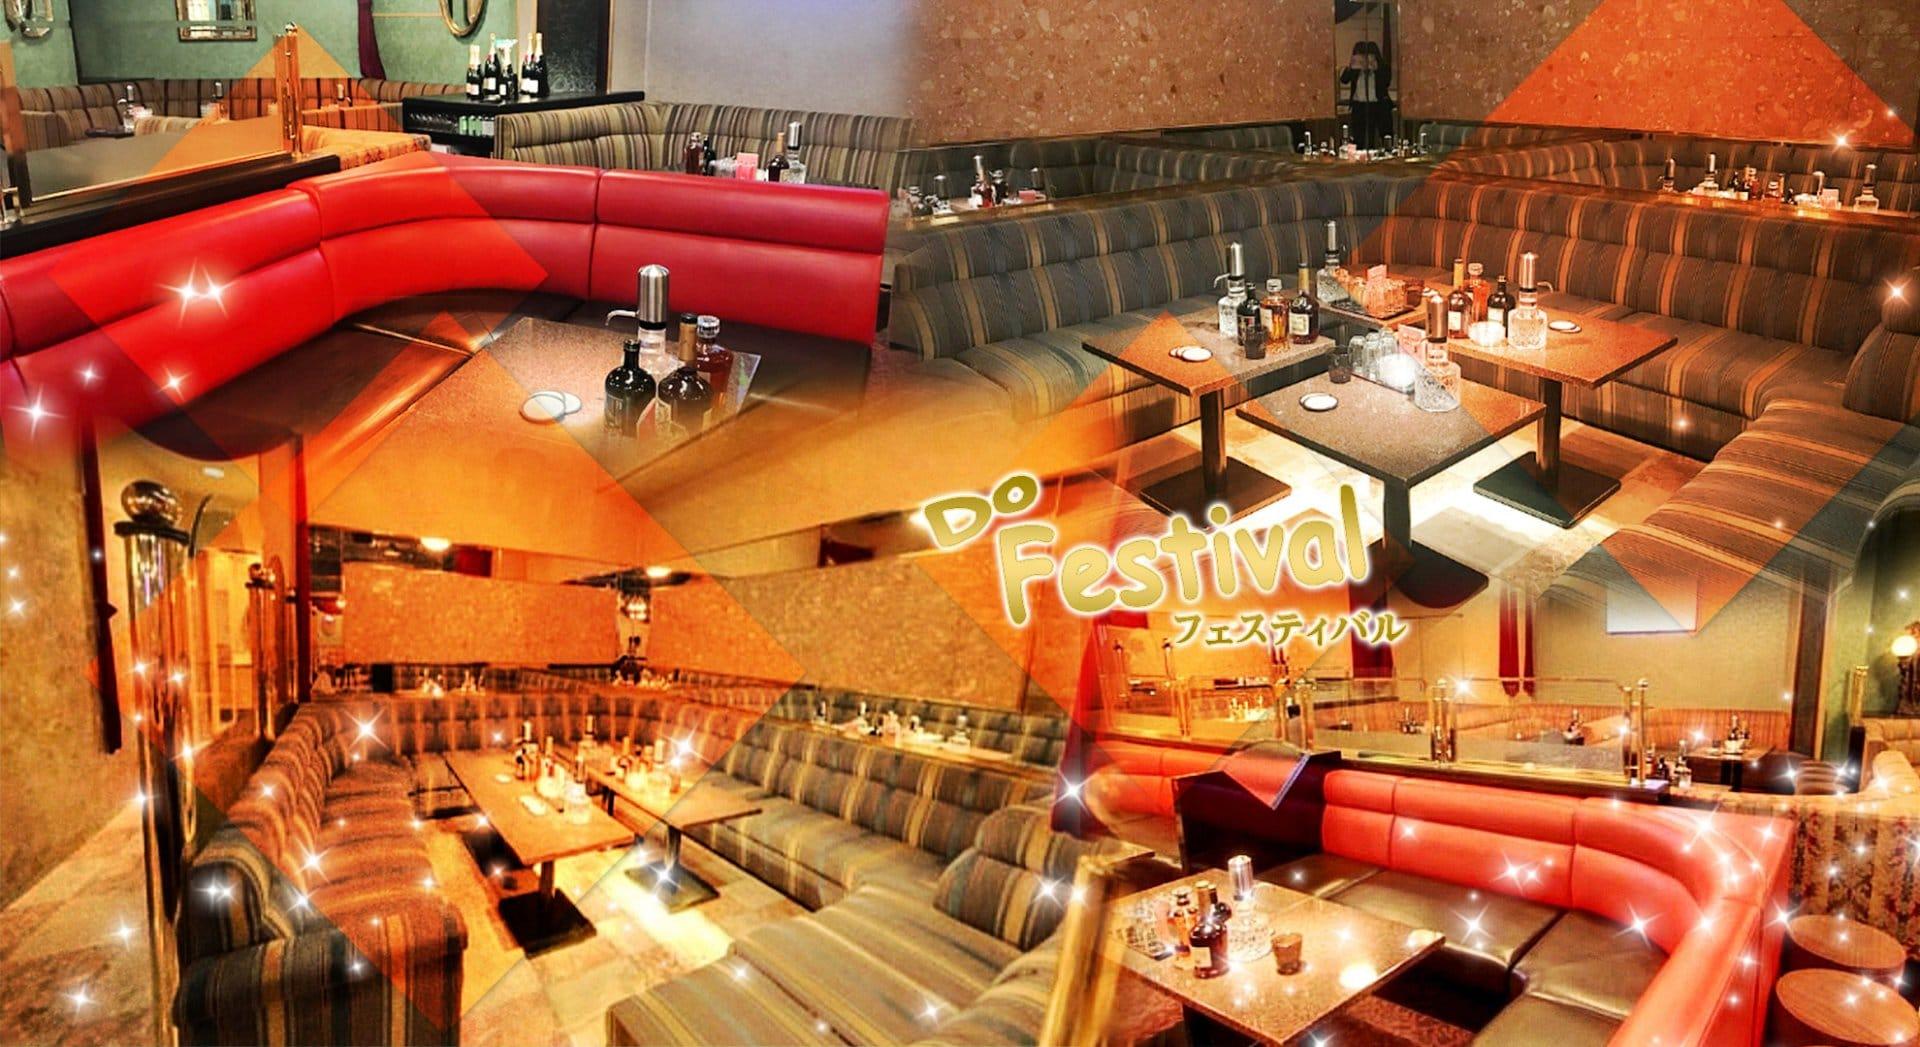 Lounge Do Festival (ドゥ フェスティバル) TOP画像